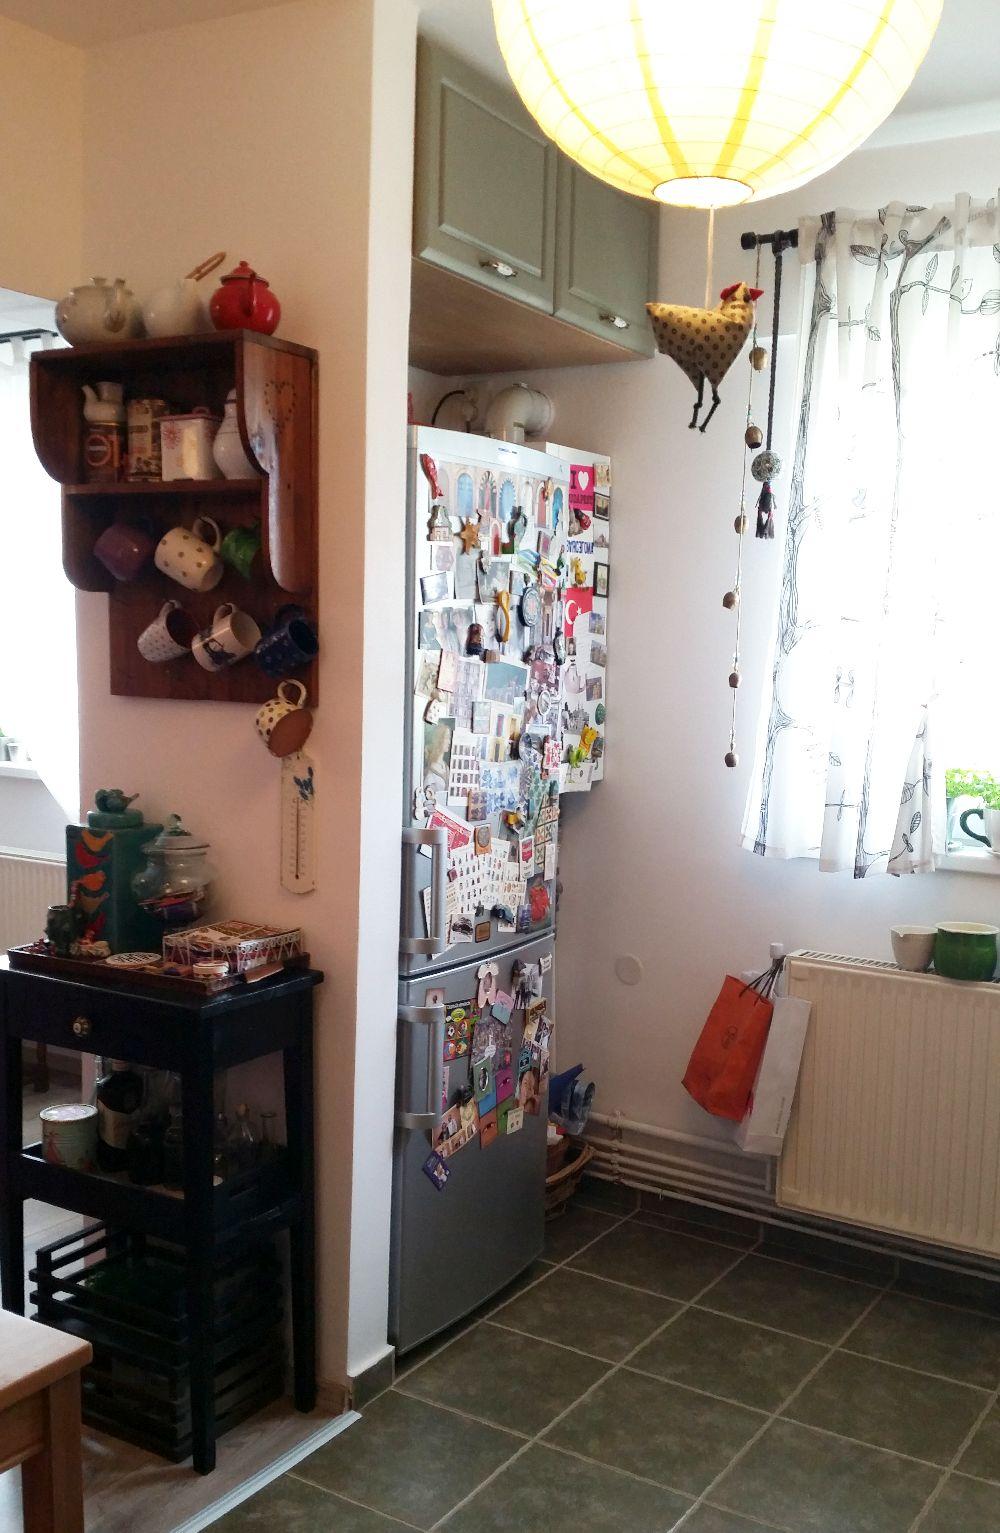 adelaparvu.com despre apartament 3 camere colorat in Sibiu, Foto Adela Parvu (47)